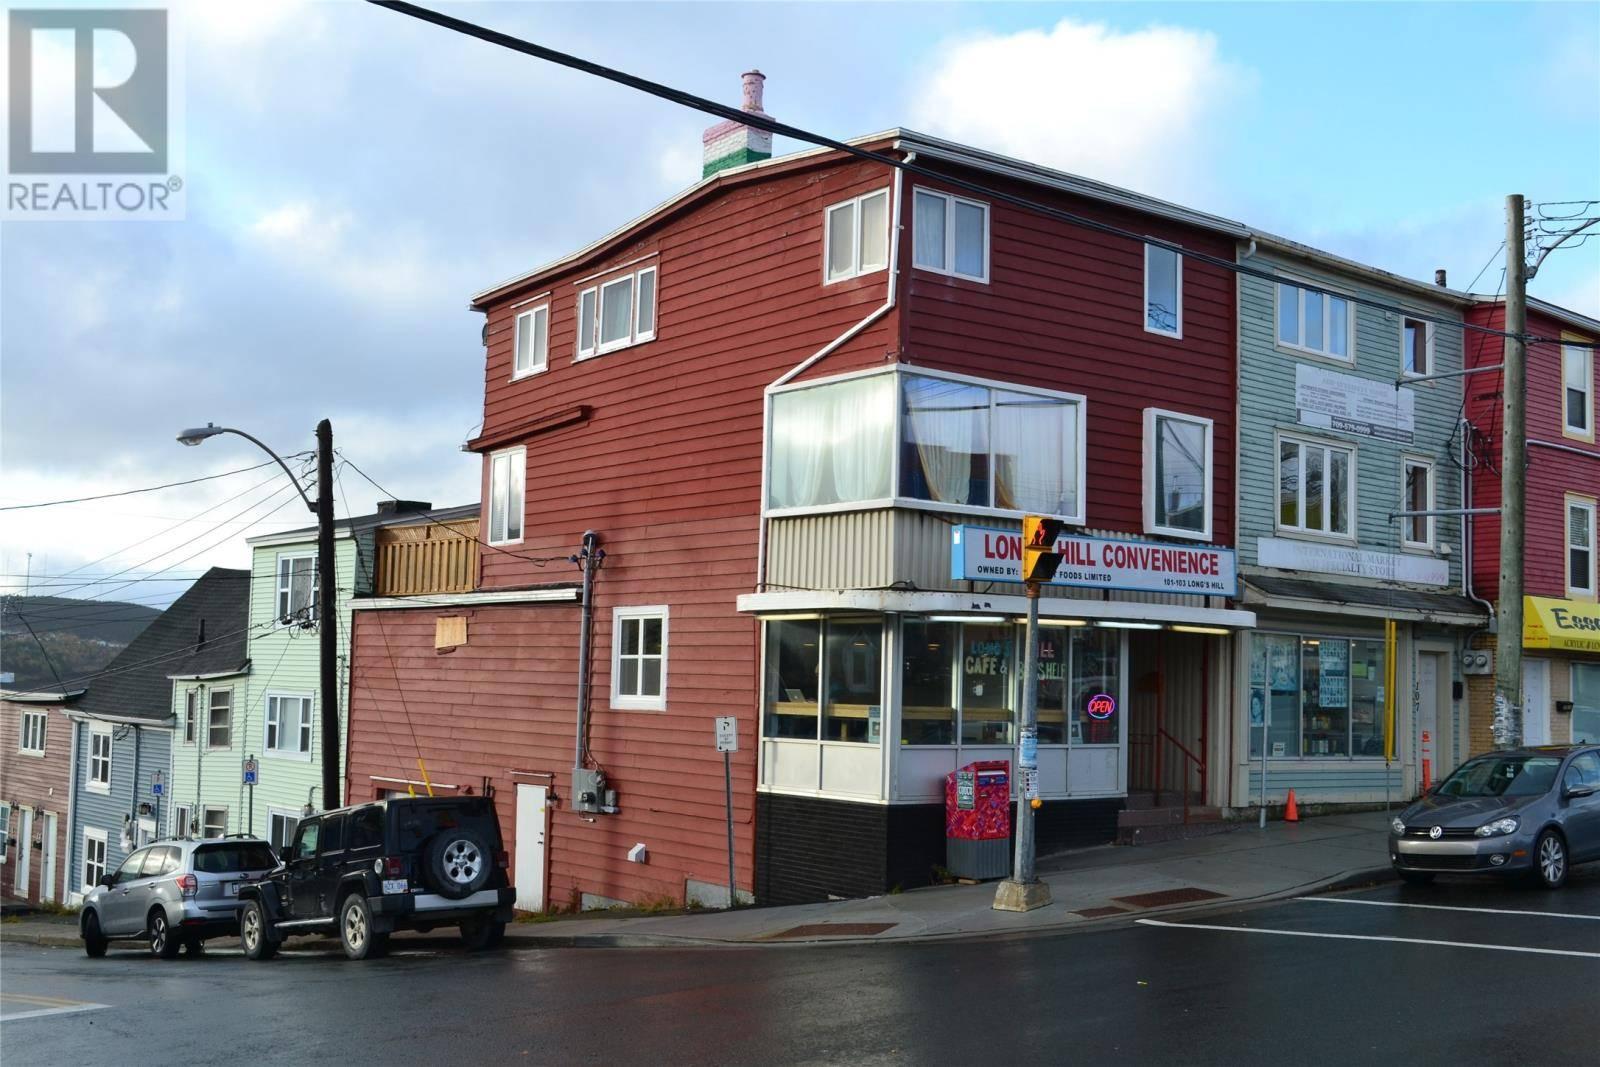 Residential property for sale at 101 Longs Hl St. John's Newfoundland - MLS: 1205619